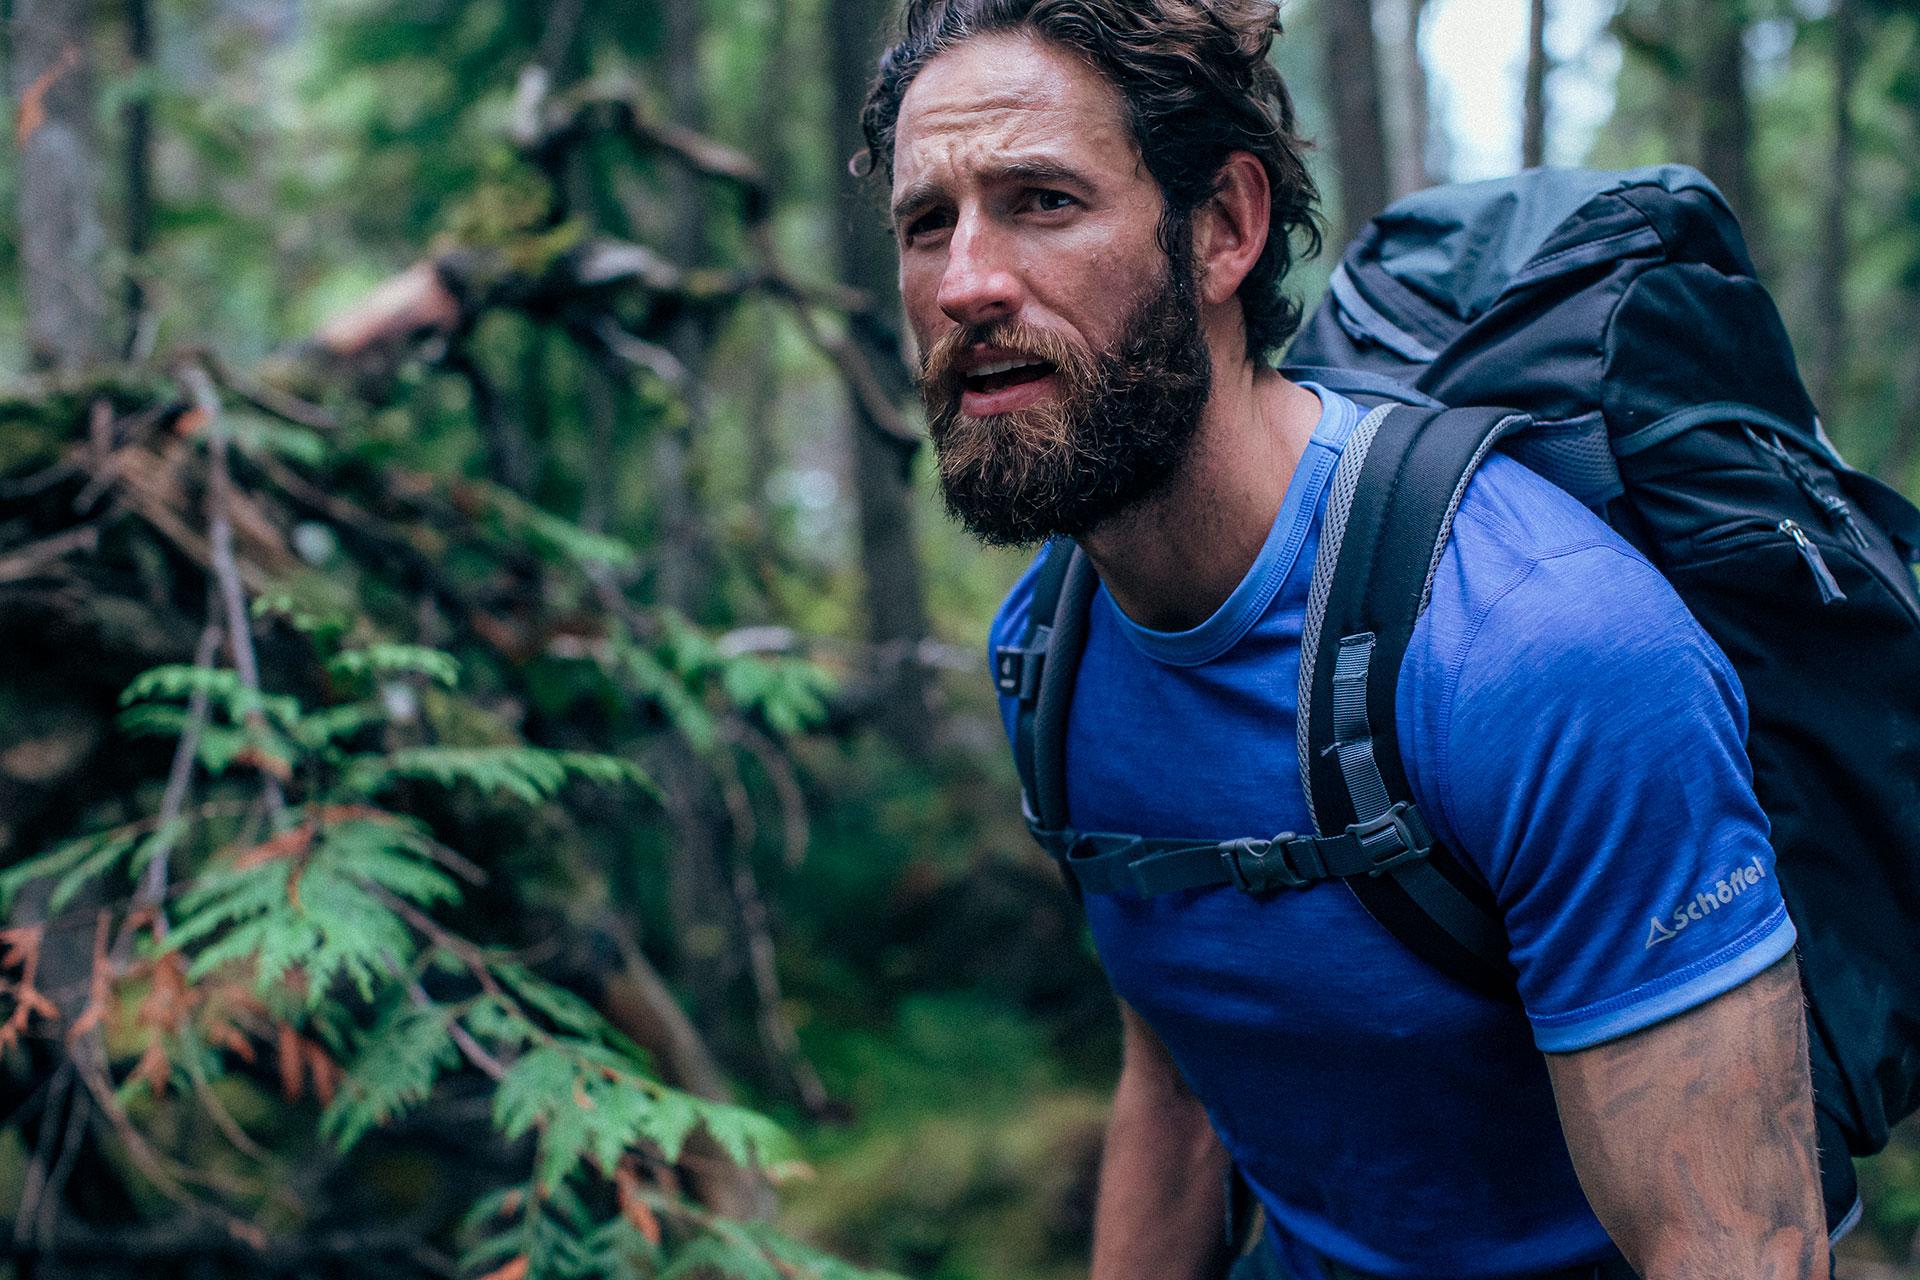 sport fotograf outdoor wandern trekking hiking rocky mountains hamburg